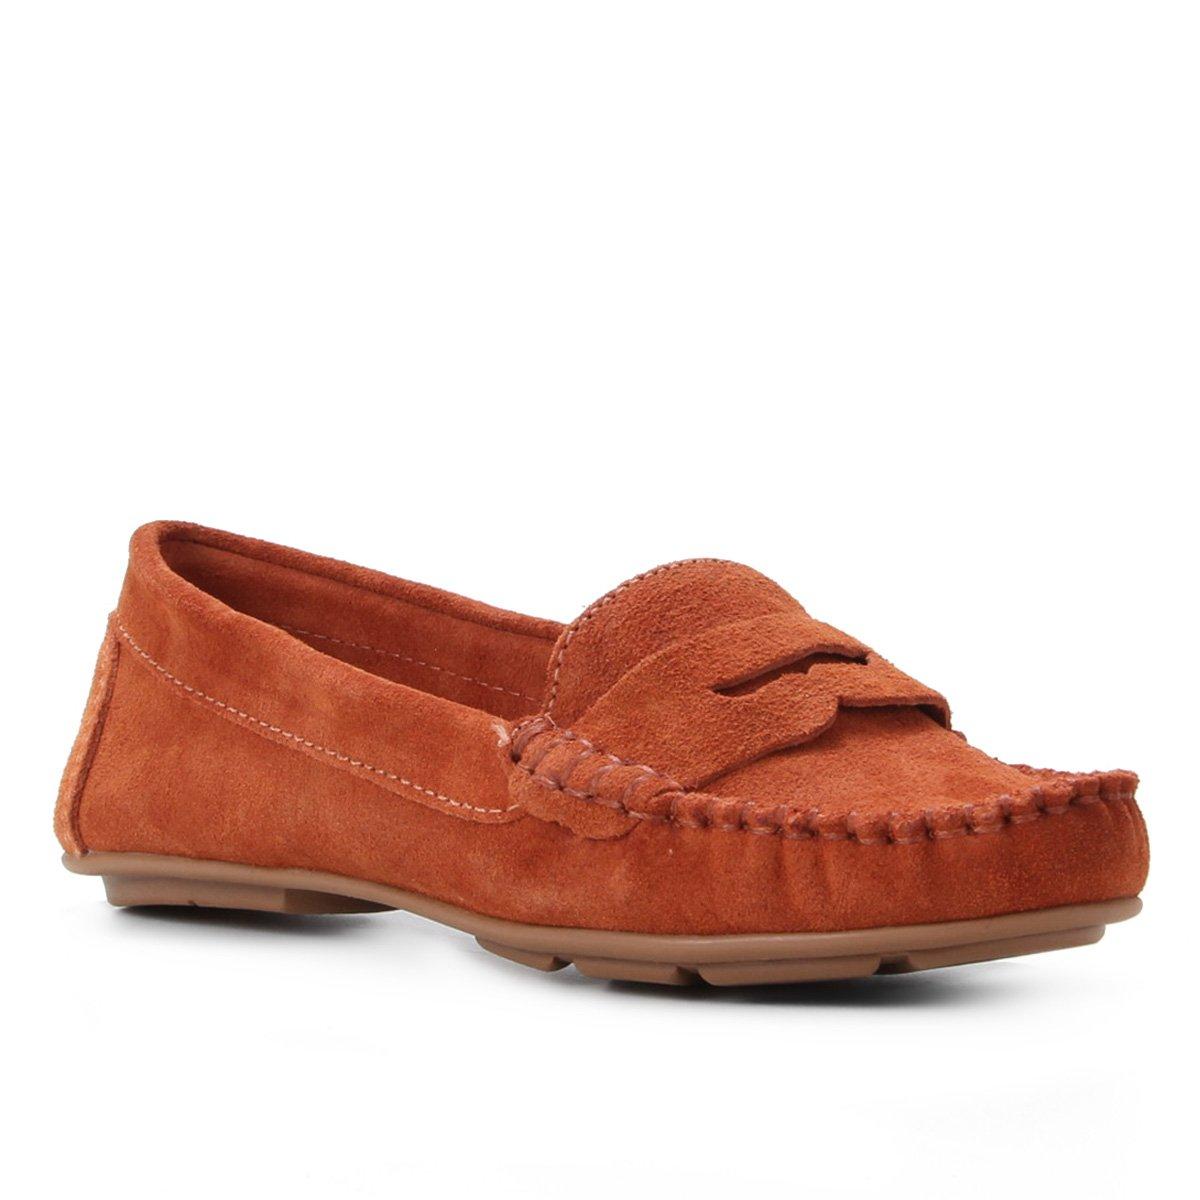 Mocassim Couro Shoestock Camurça Gravata Feminino